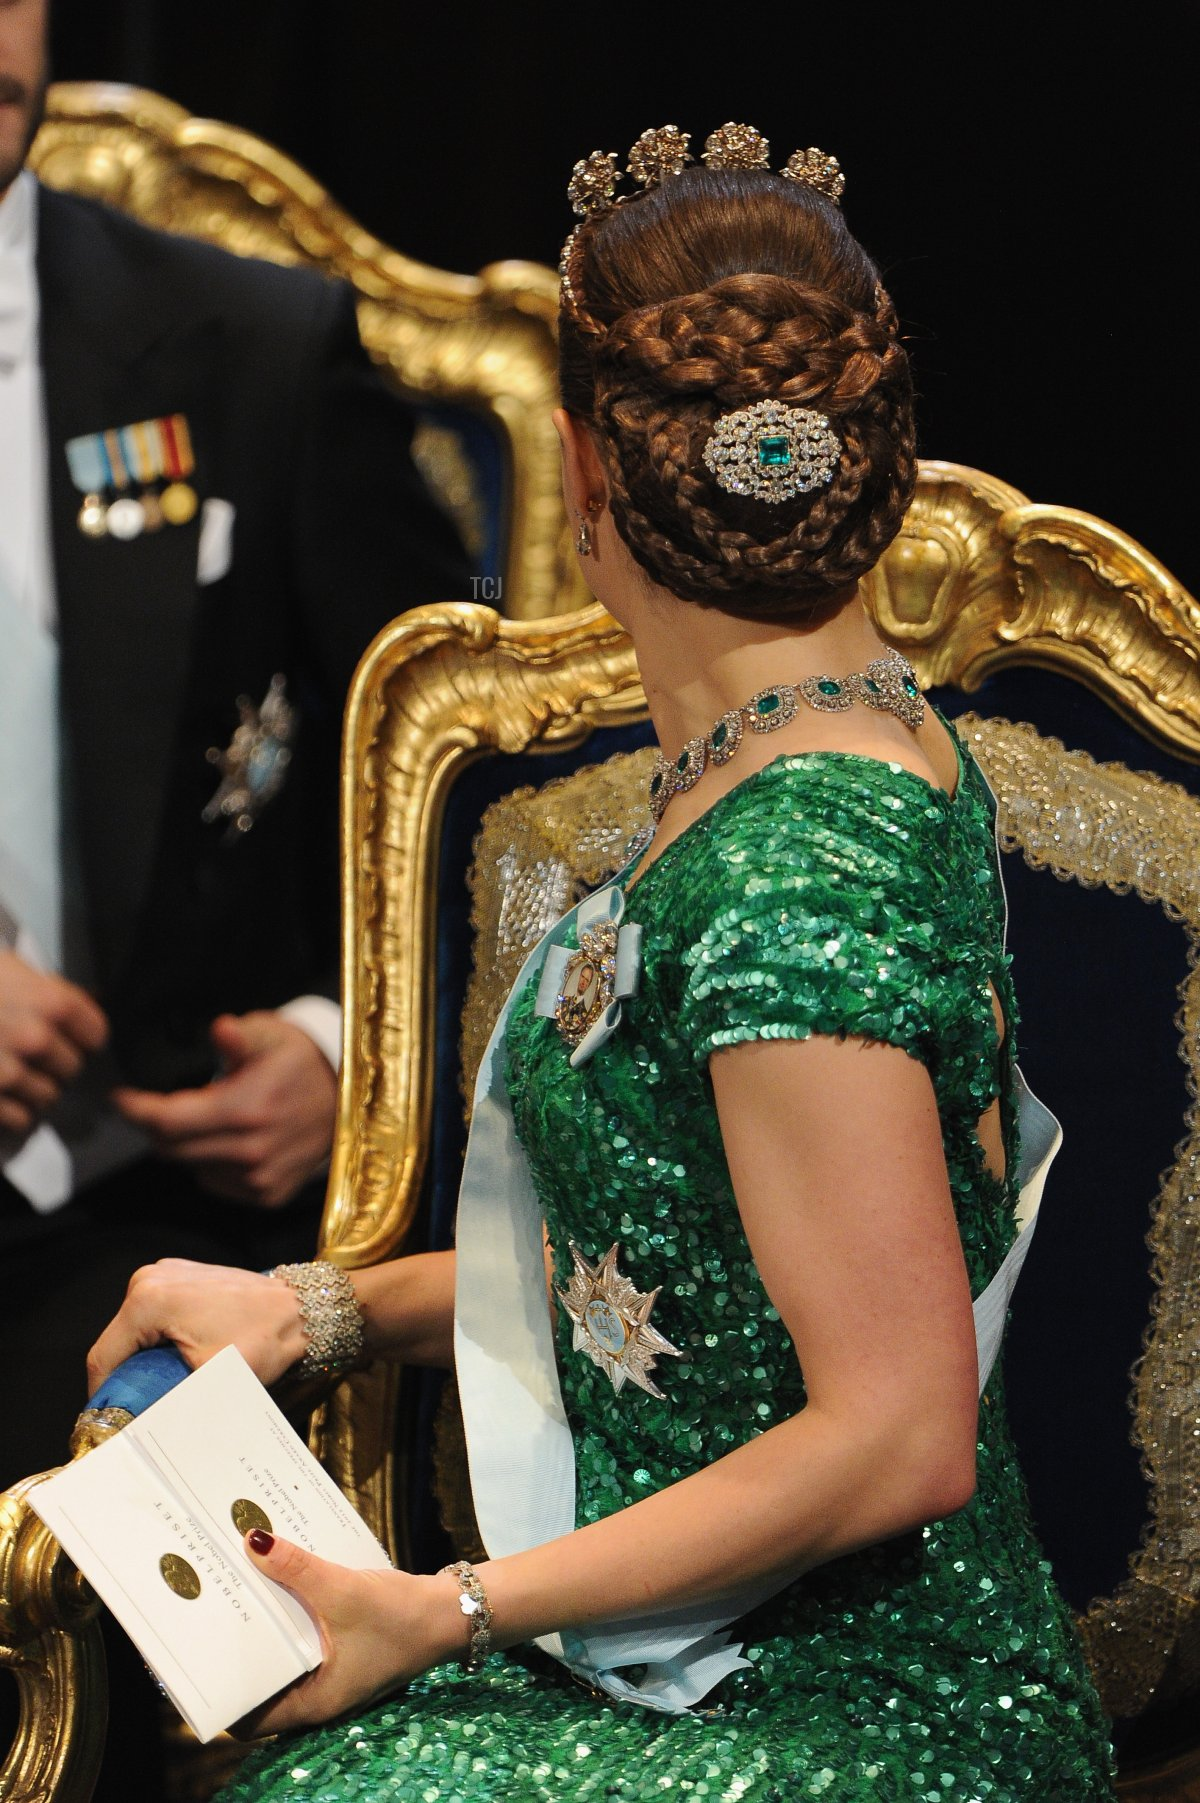 Crown Princess Victoria of Sweden attends the 2012 Nobel Prize Award Ceremony at Concert Hall on December 10, 2012 in Stockholm